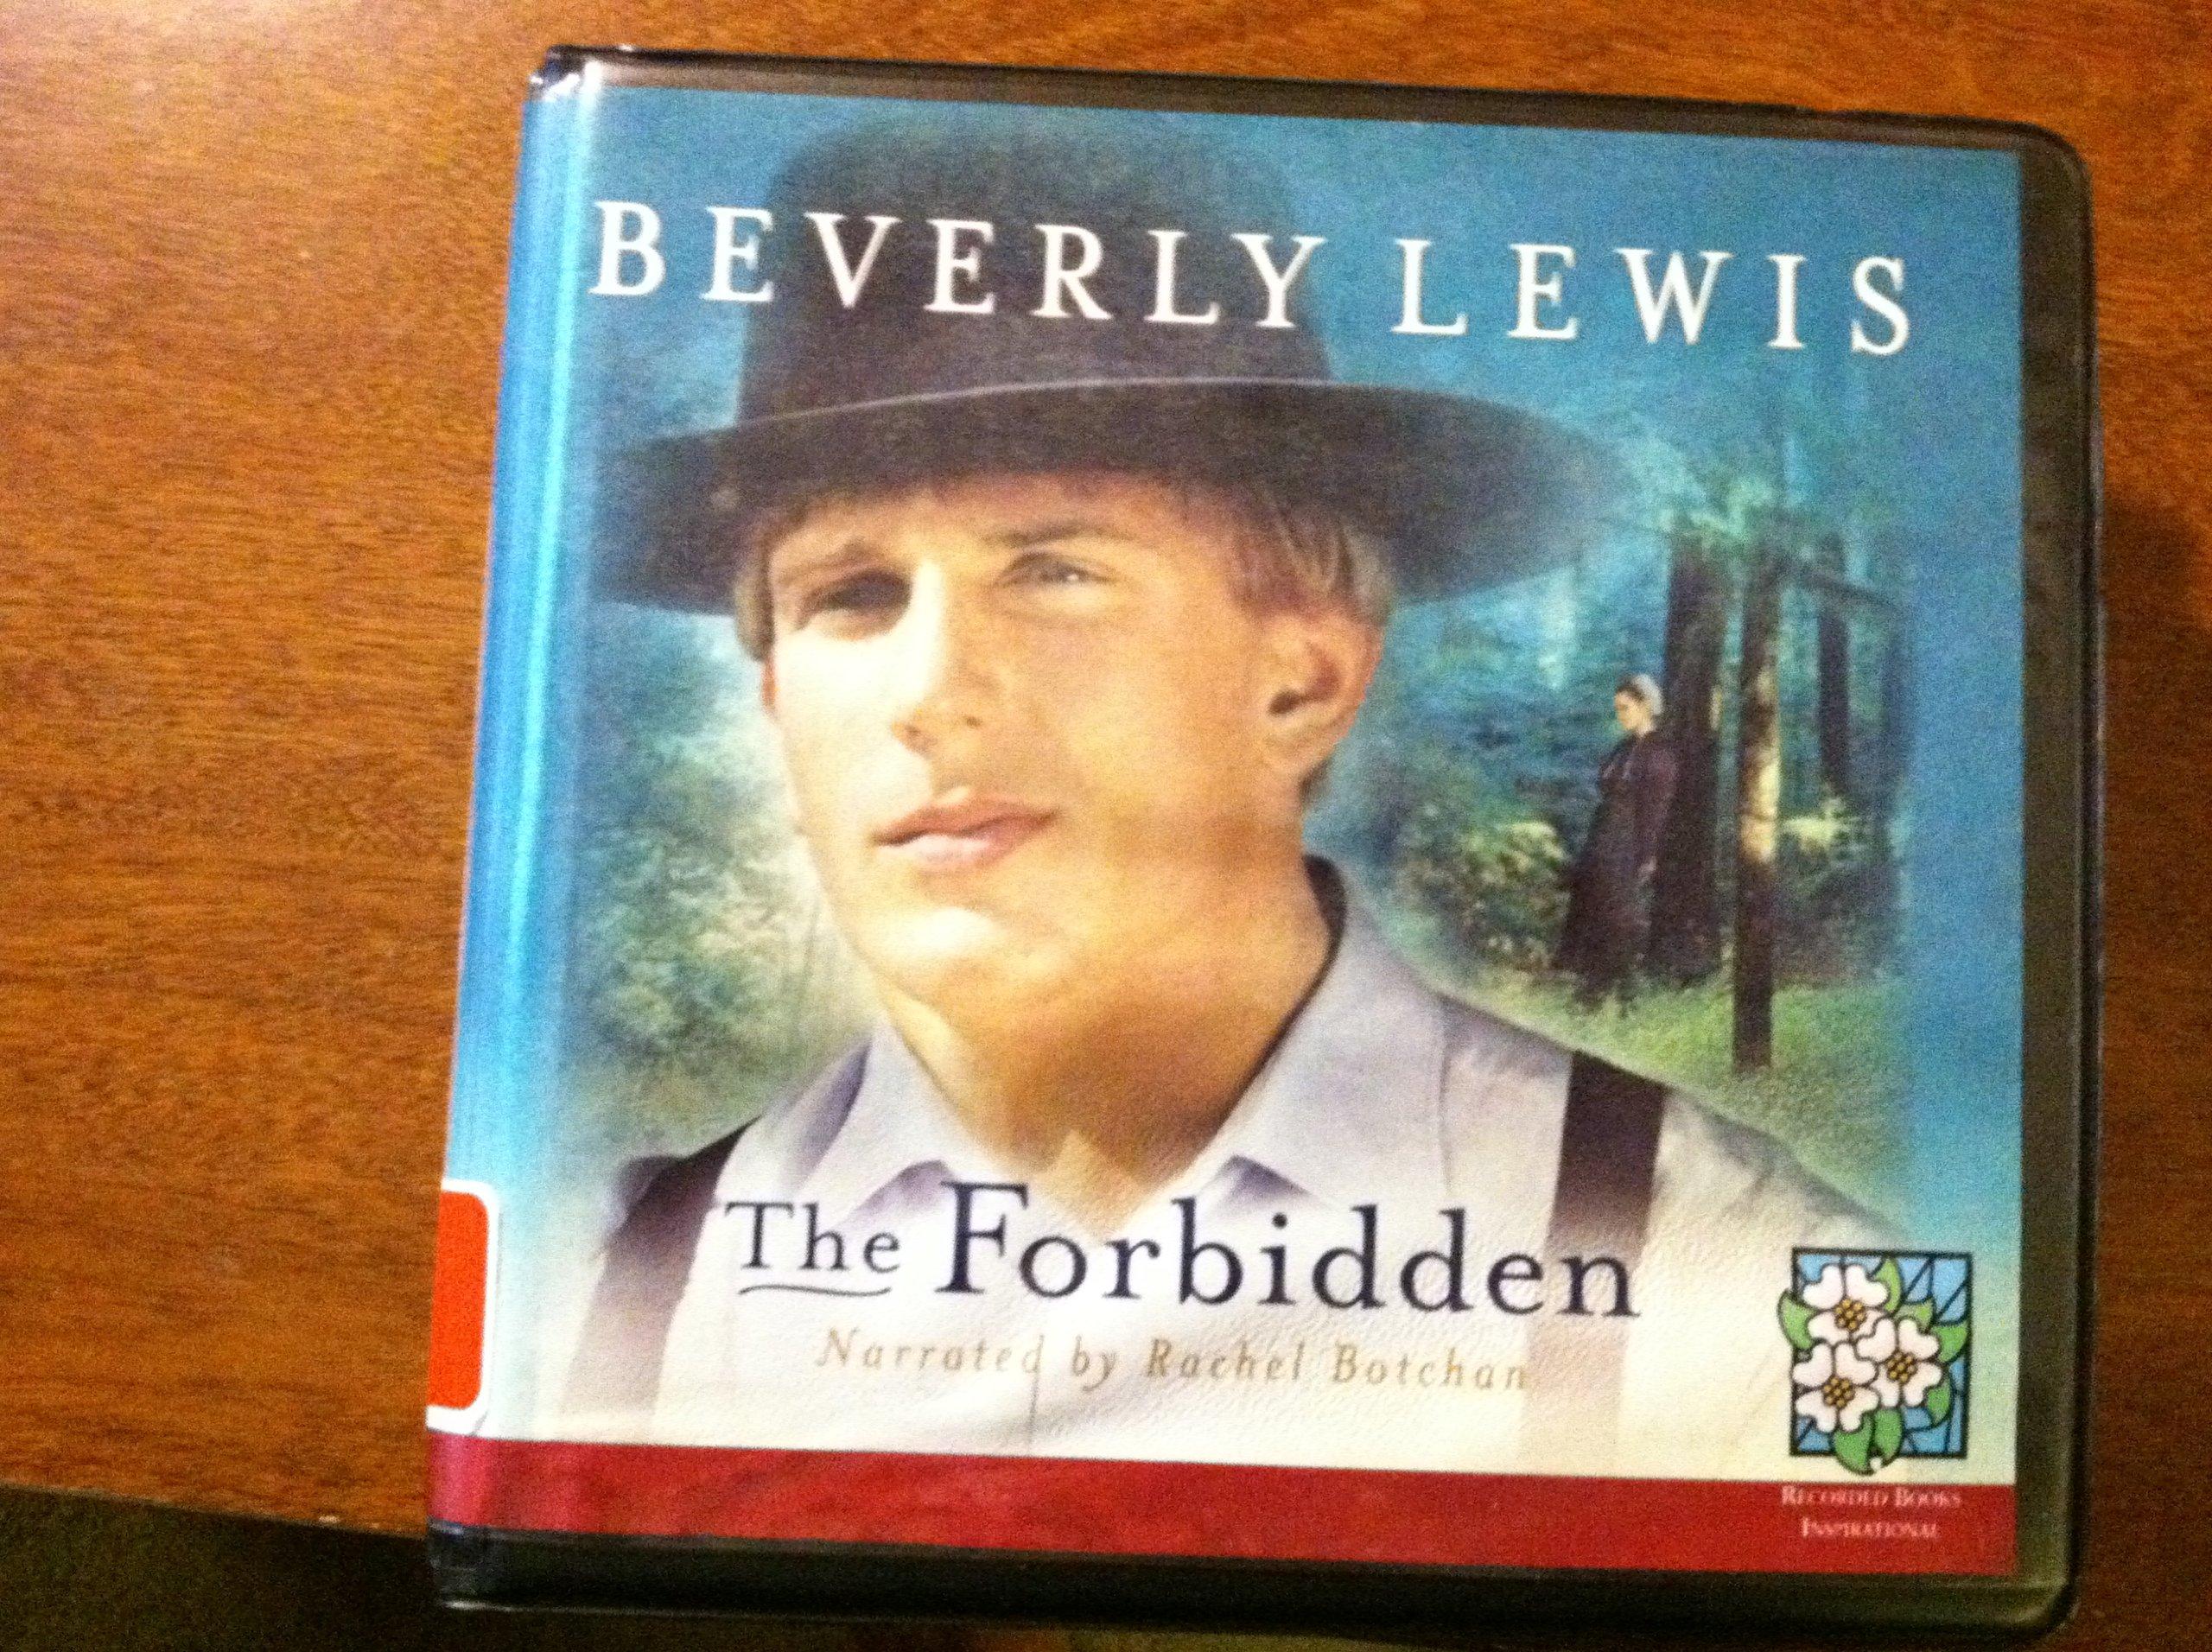 The Forbidden, 10 Cds [Library Edition]: Beverly Lewis, Rachel Botchan:  9781436135177: Amazon.com: Books